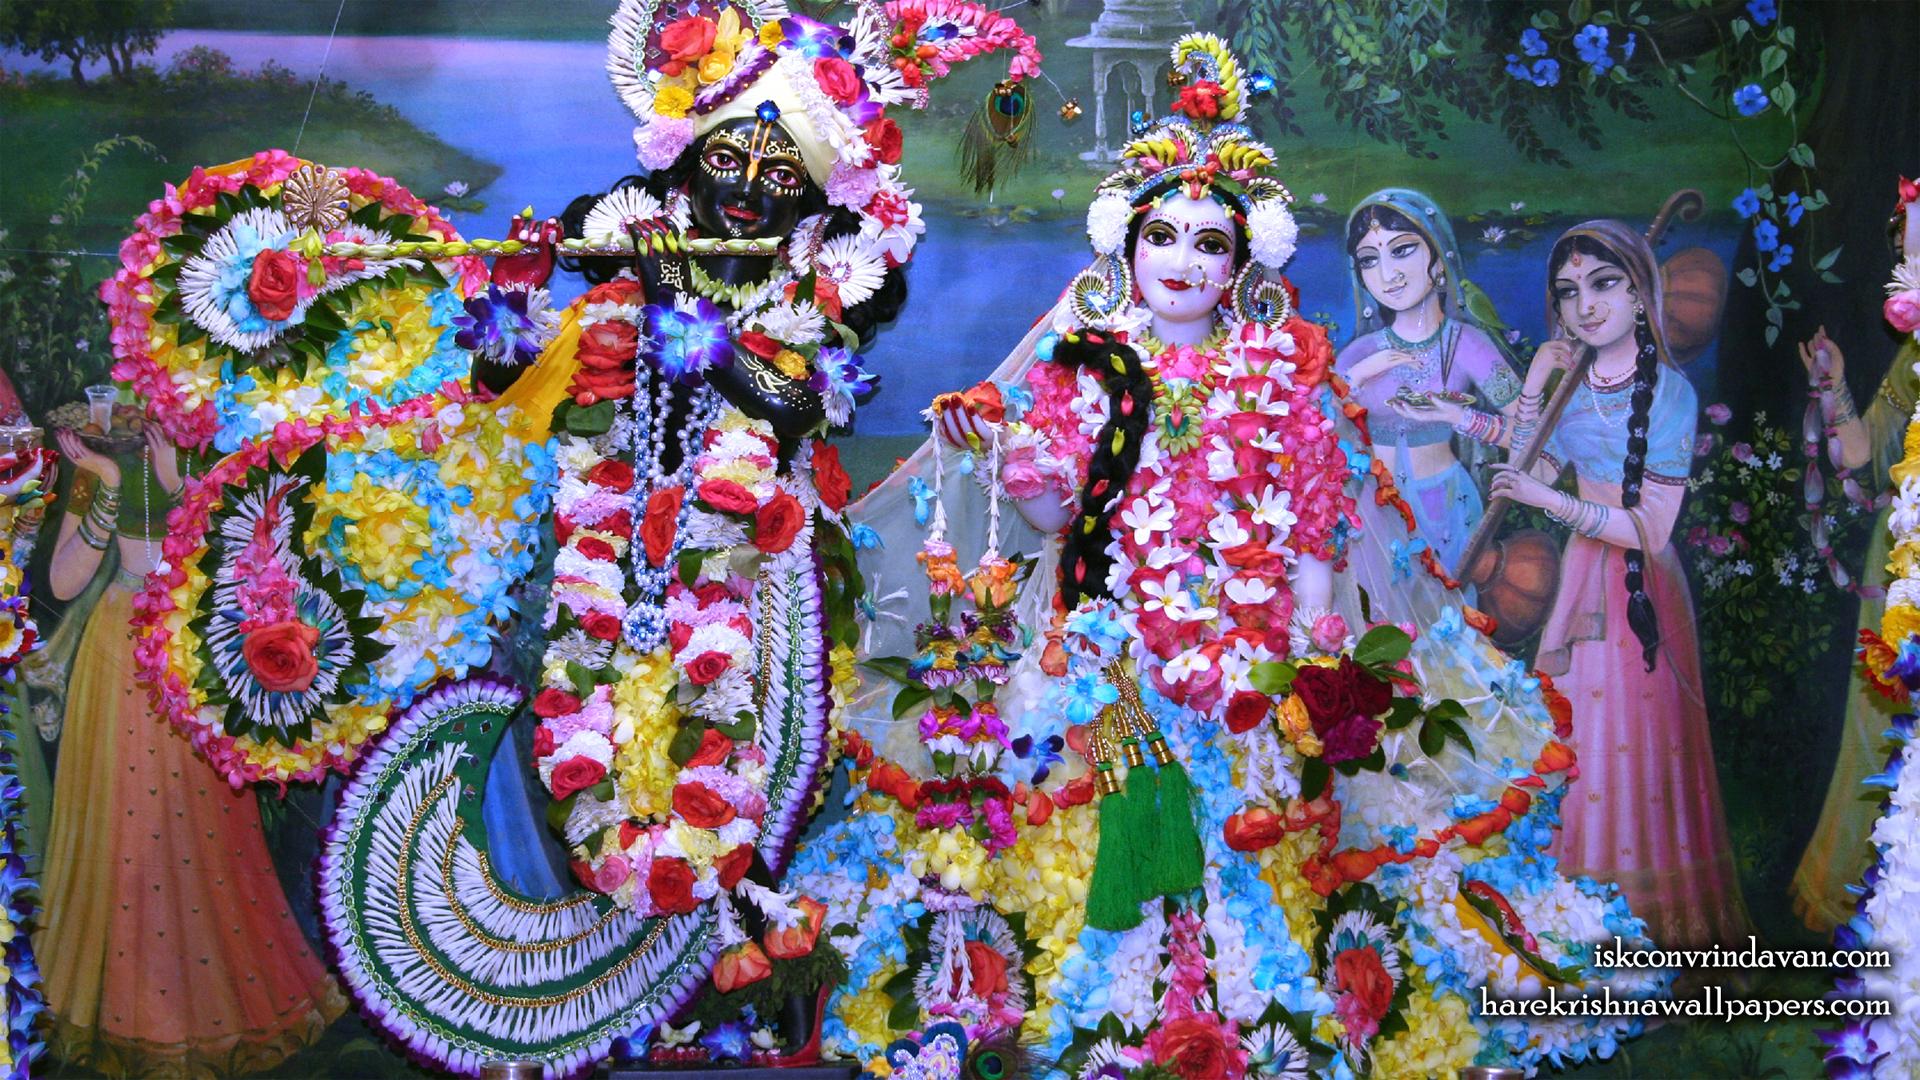 Sri Sri Radha Shyamsundar Wallpaper (008) Size 1920x1080 Download